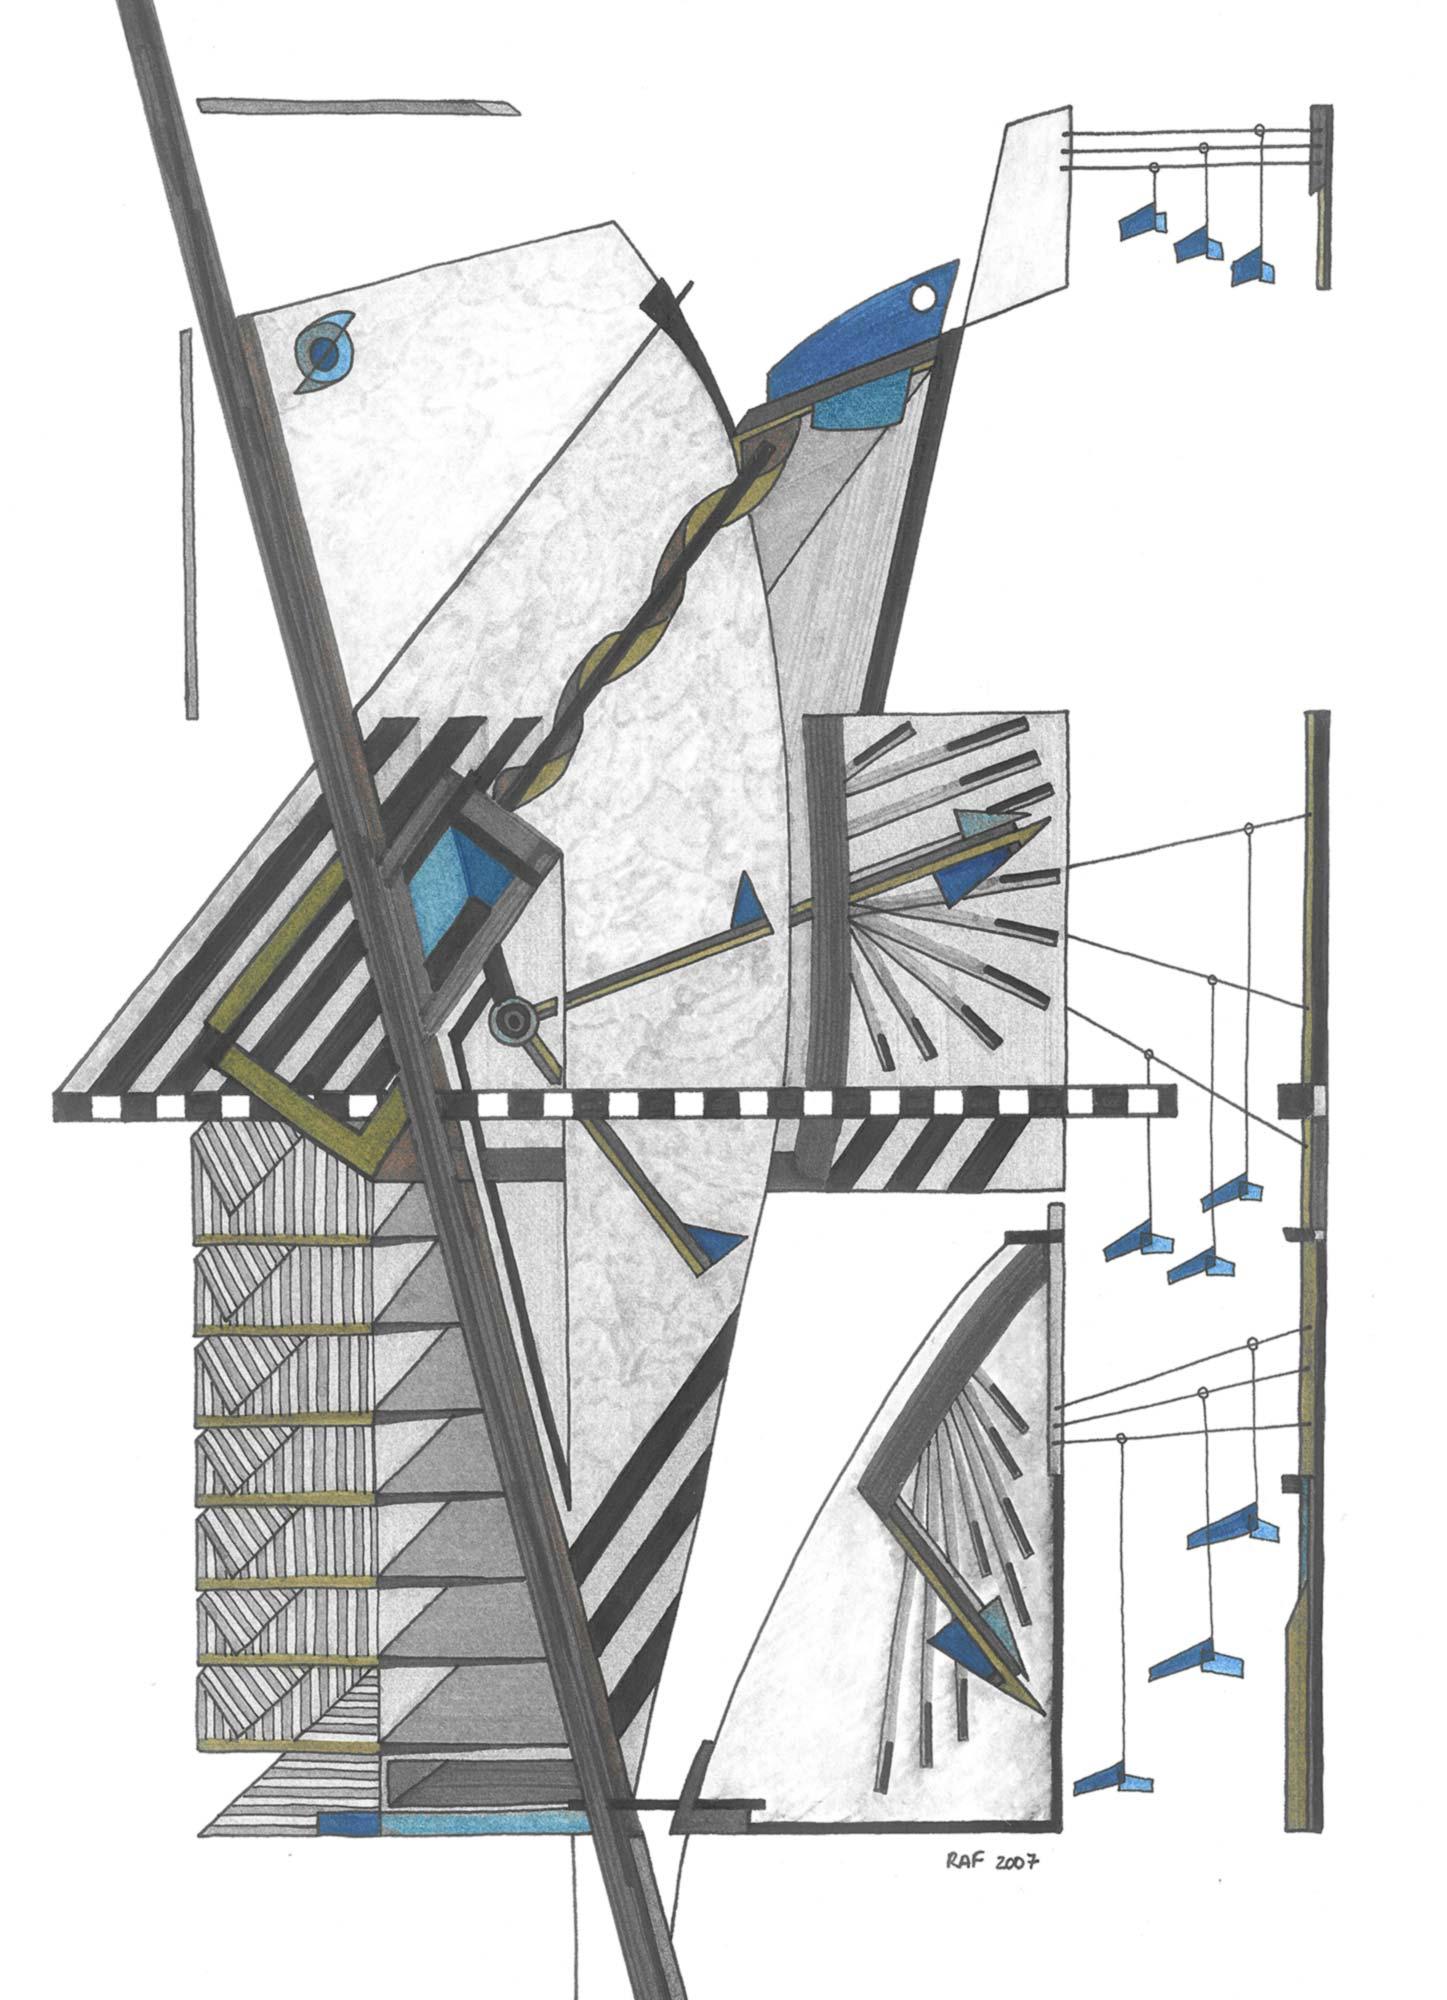 14h25, dessin, Raf Listowski, 2007